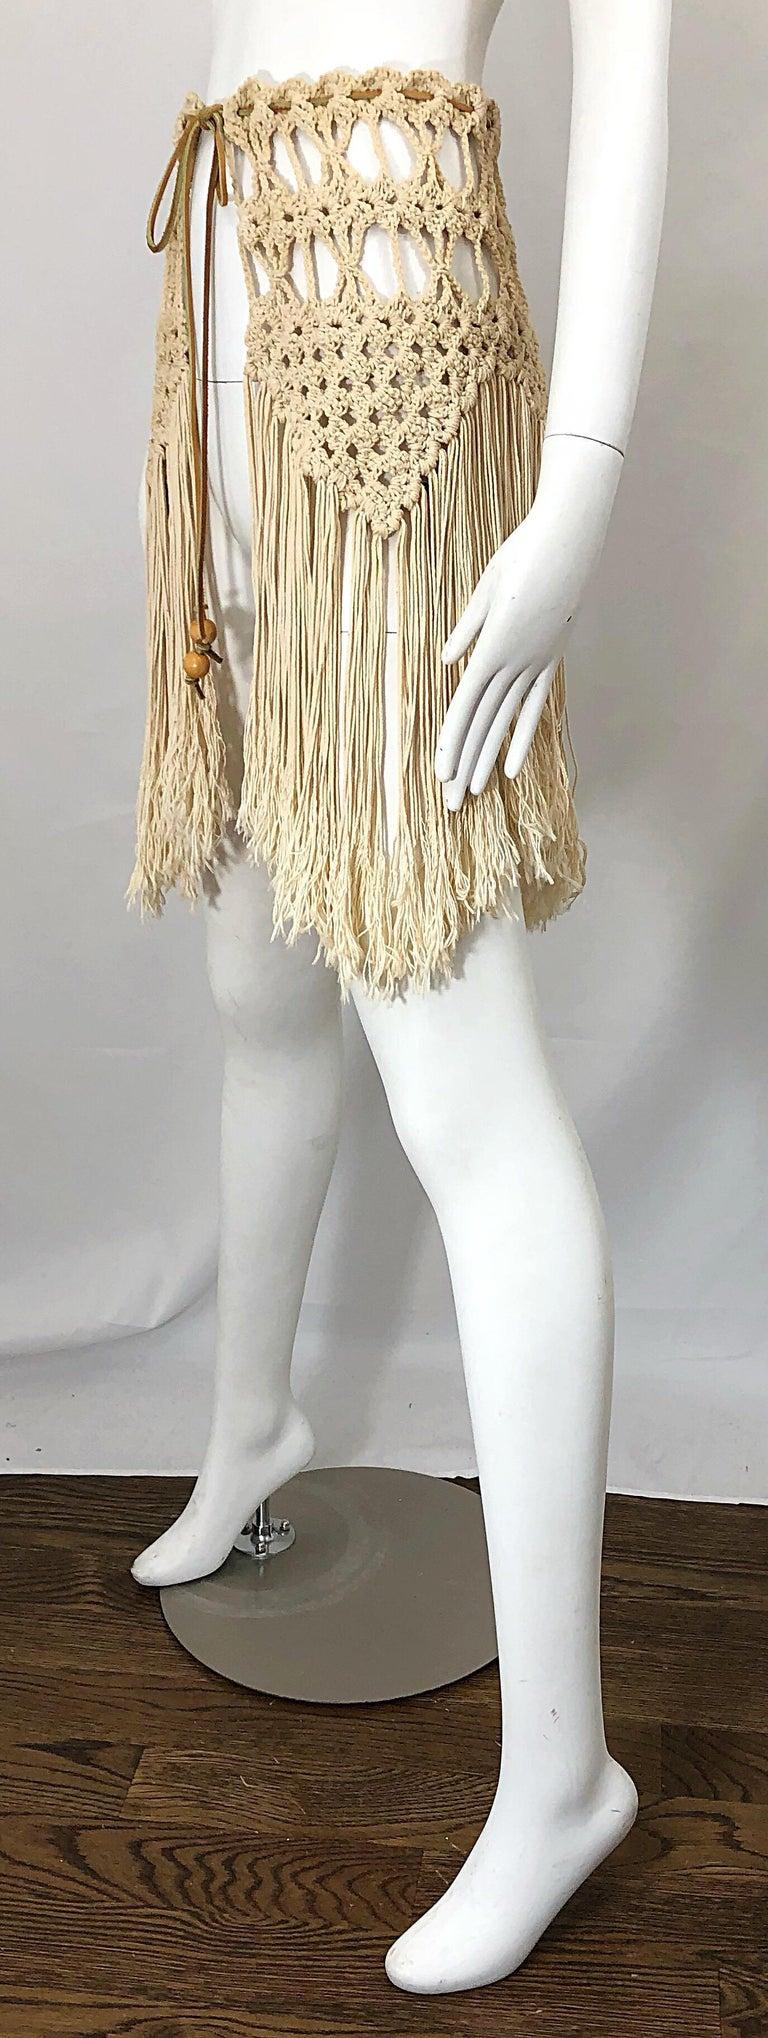 Women's or Men's 1970s Amazing Khaki Brown Boho Vintage 70s Crochet Fringe Belt Or Capelet Cape For Sale